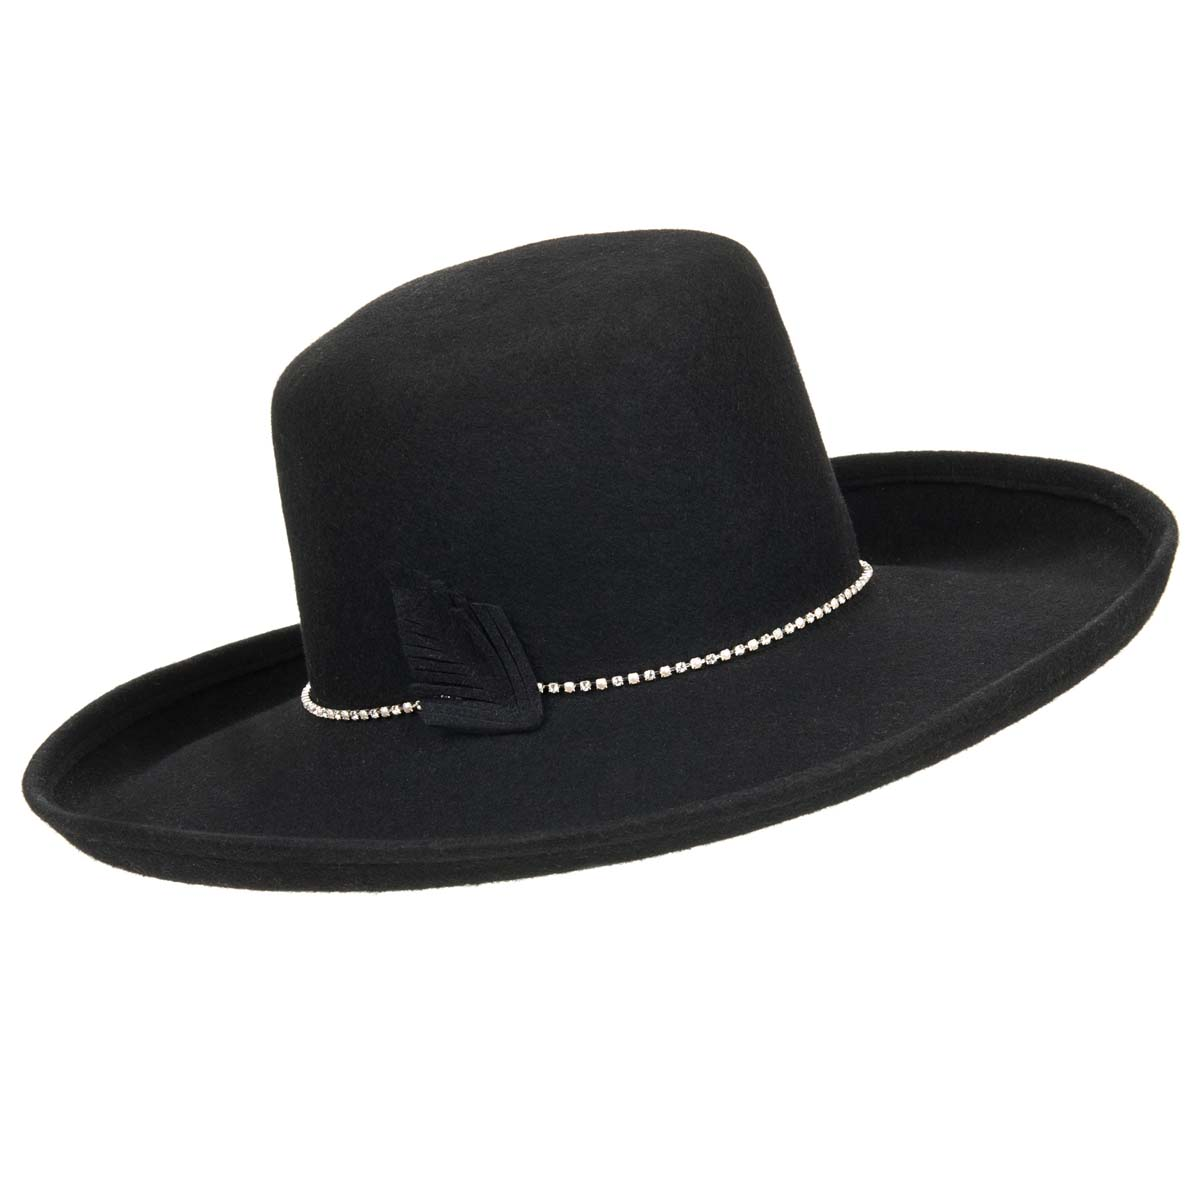 cappello a tesa larga da donna in 100% feltro di lana